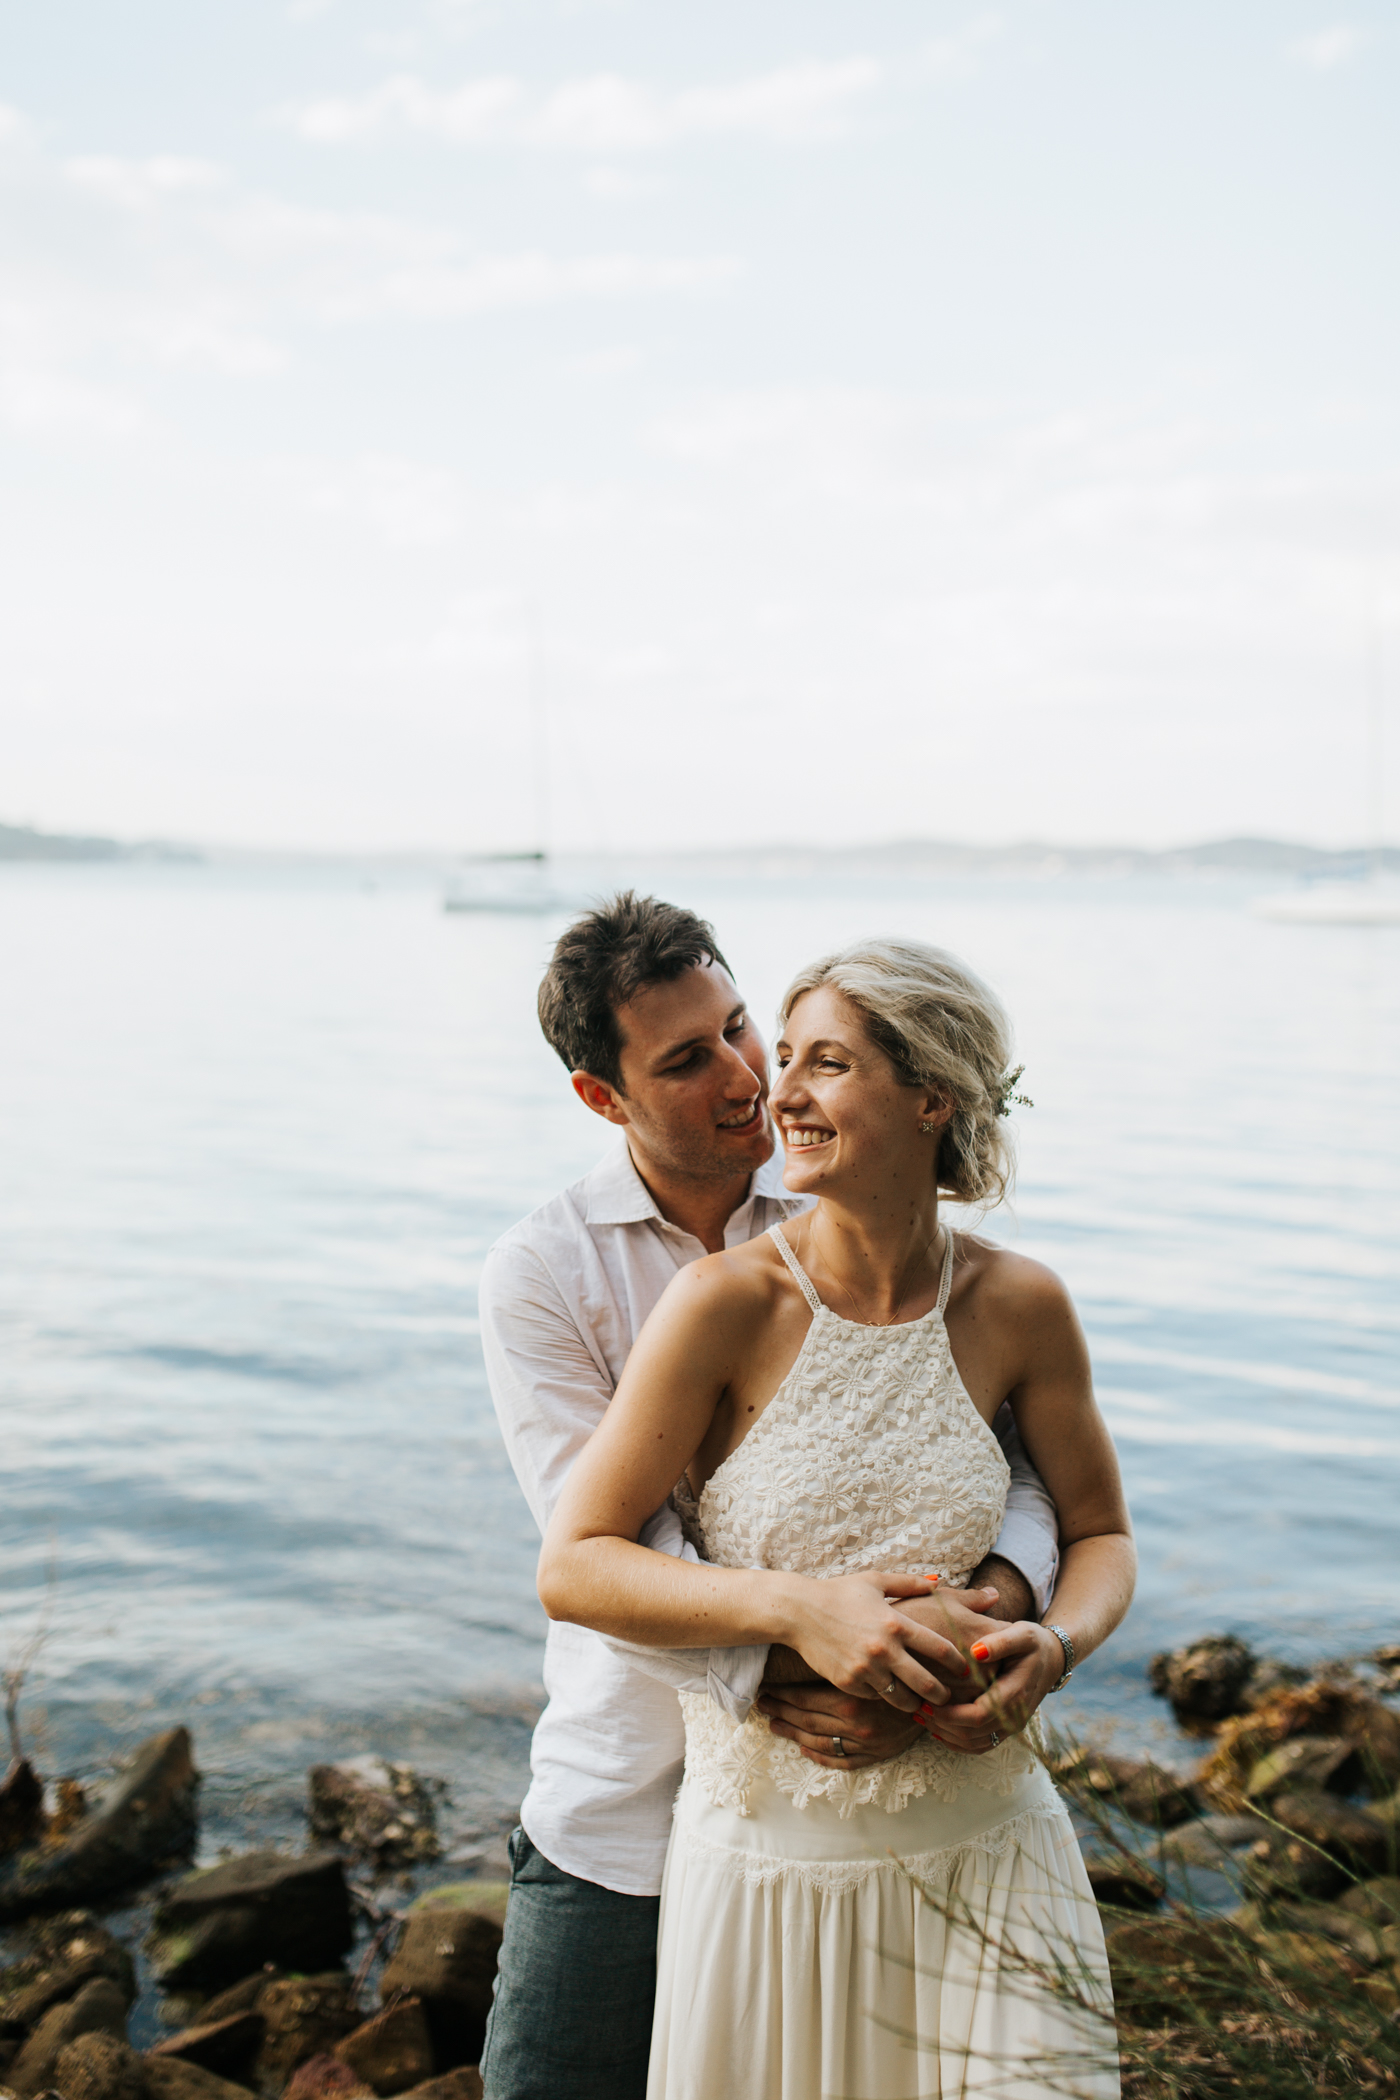 Emma & Ben - Lake Macquarie - Hunter Valley Wedding - Samantha Heather Photography-201.jpg